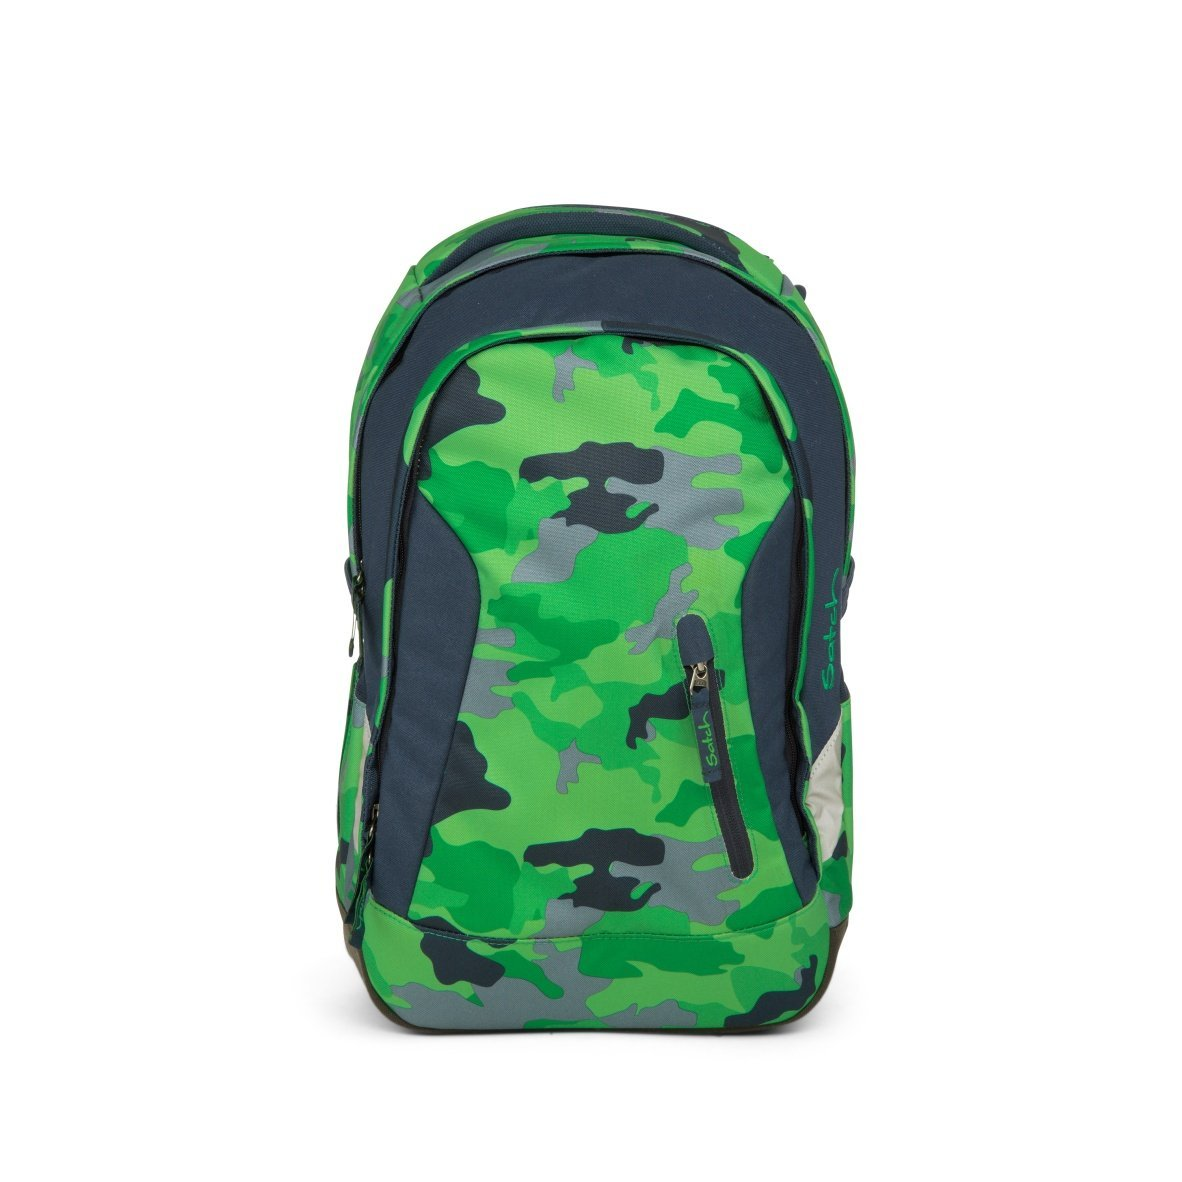 Рюкзак Ergobag Satch Sleek цвет Green Camou, - фото 2